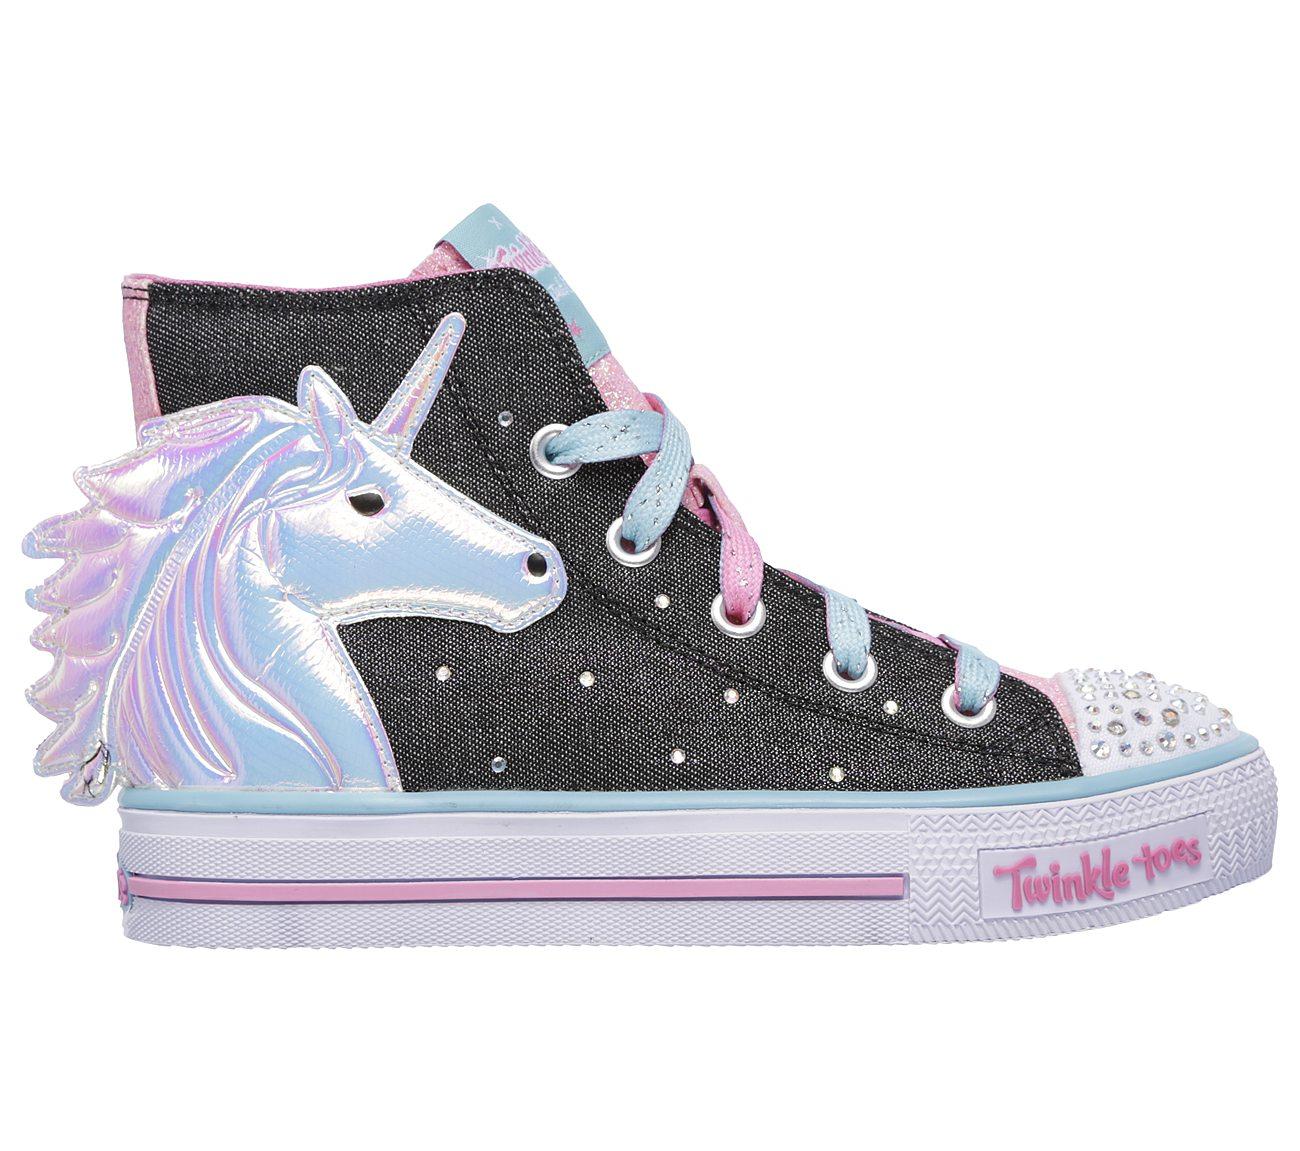 6e25d5b80b48e Buy SKECHERS Twinkle Toes: Shuffles - Prancing Pretty S-Lights Shoes ...